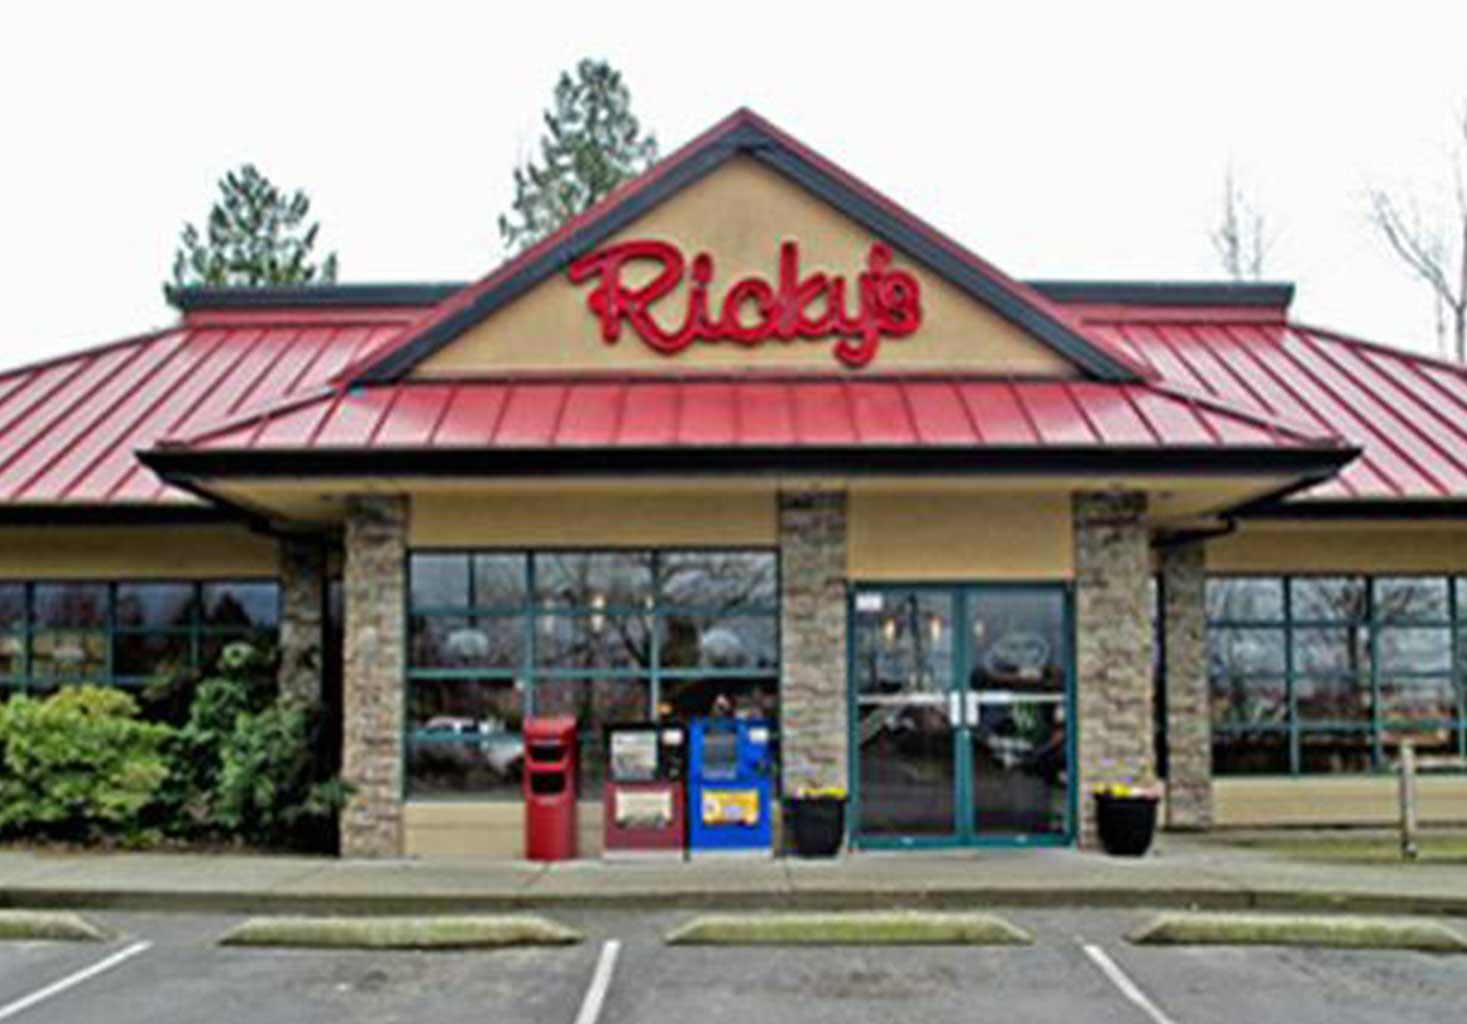 Ricky's Restaurant in Walnut Grove